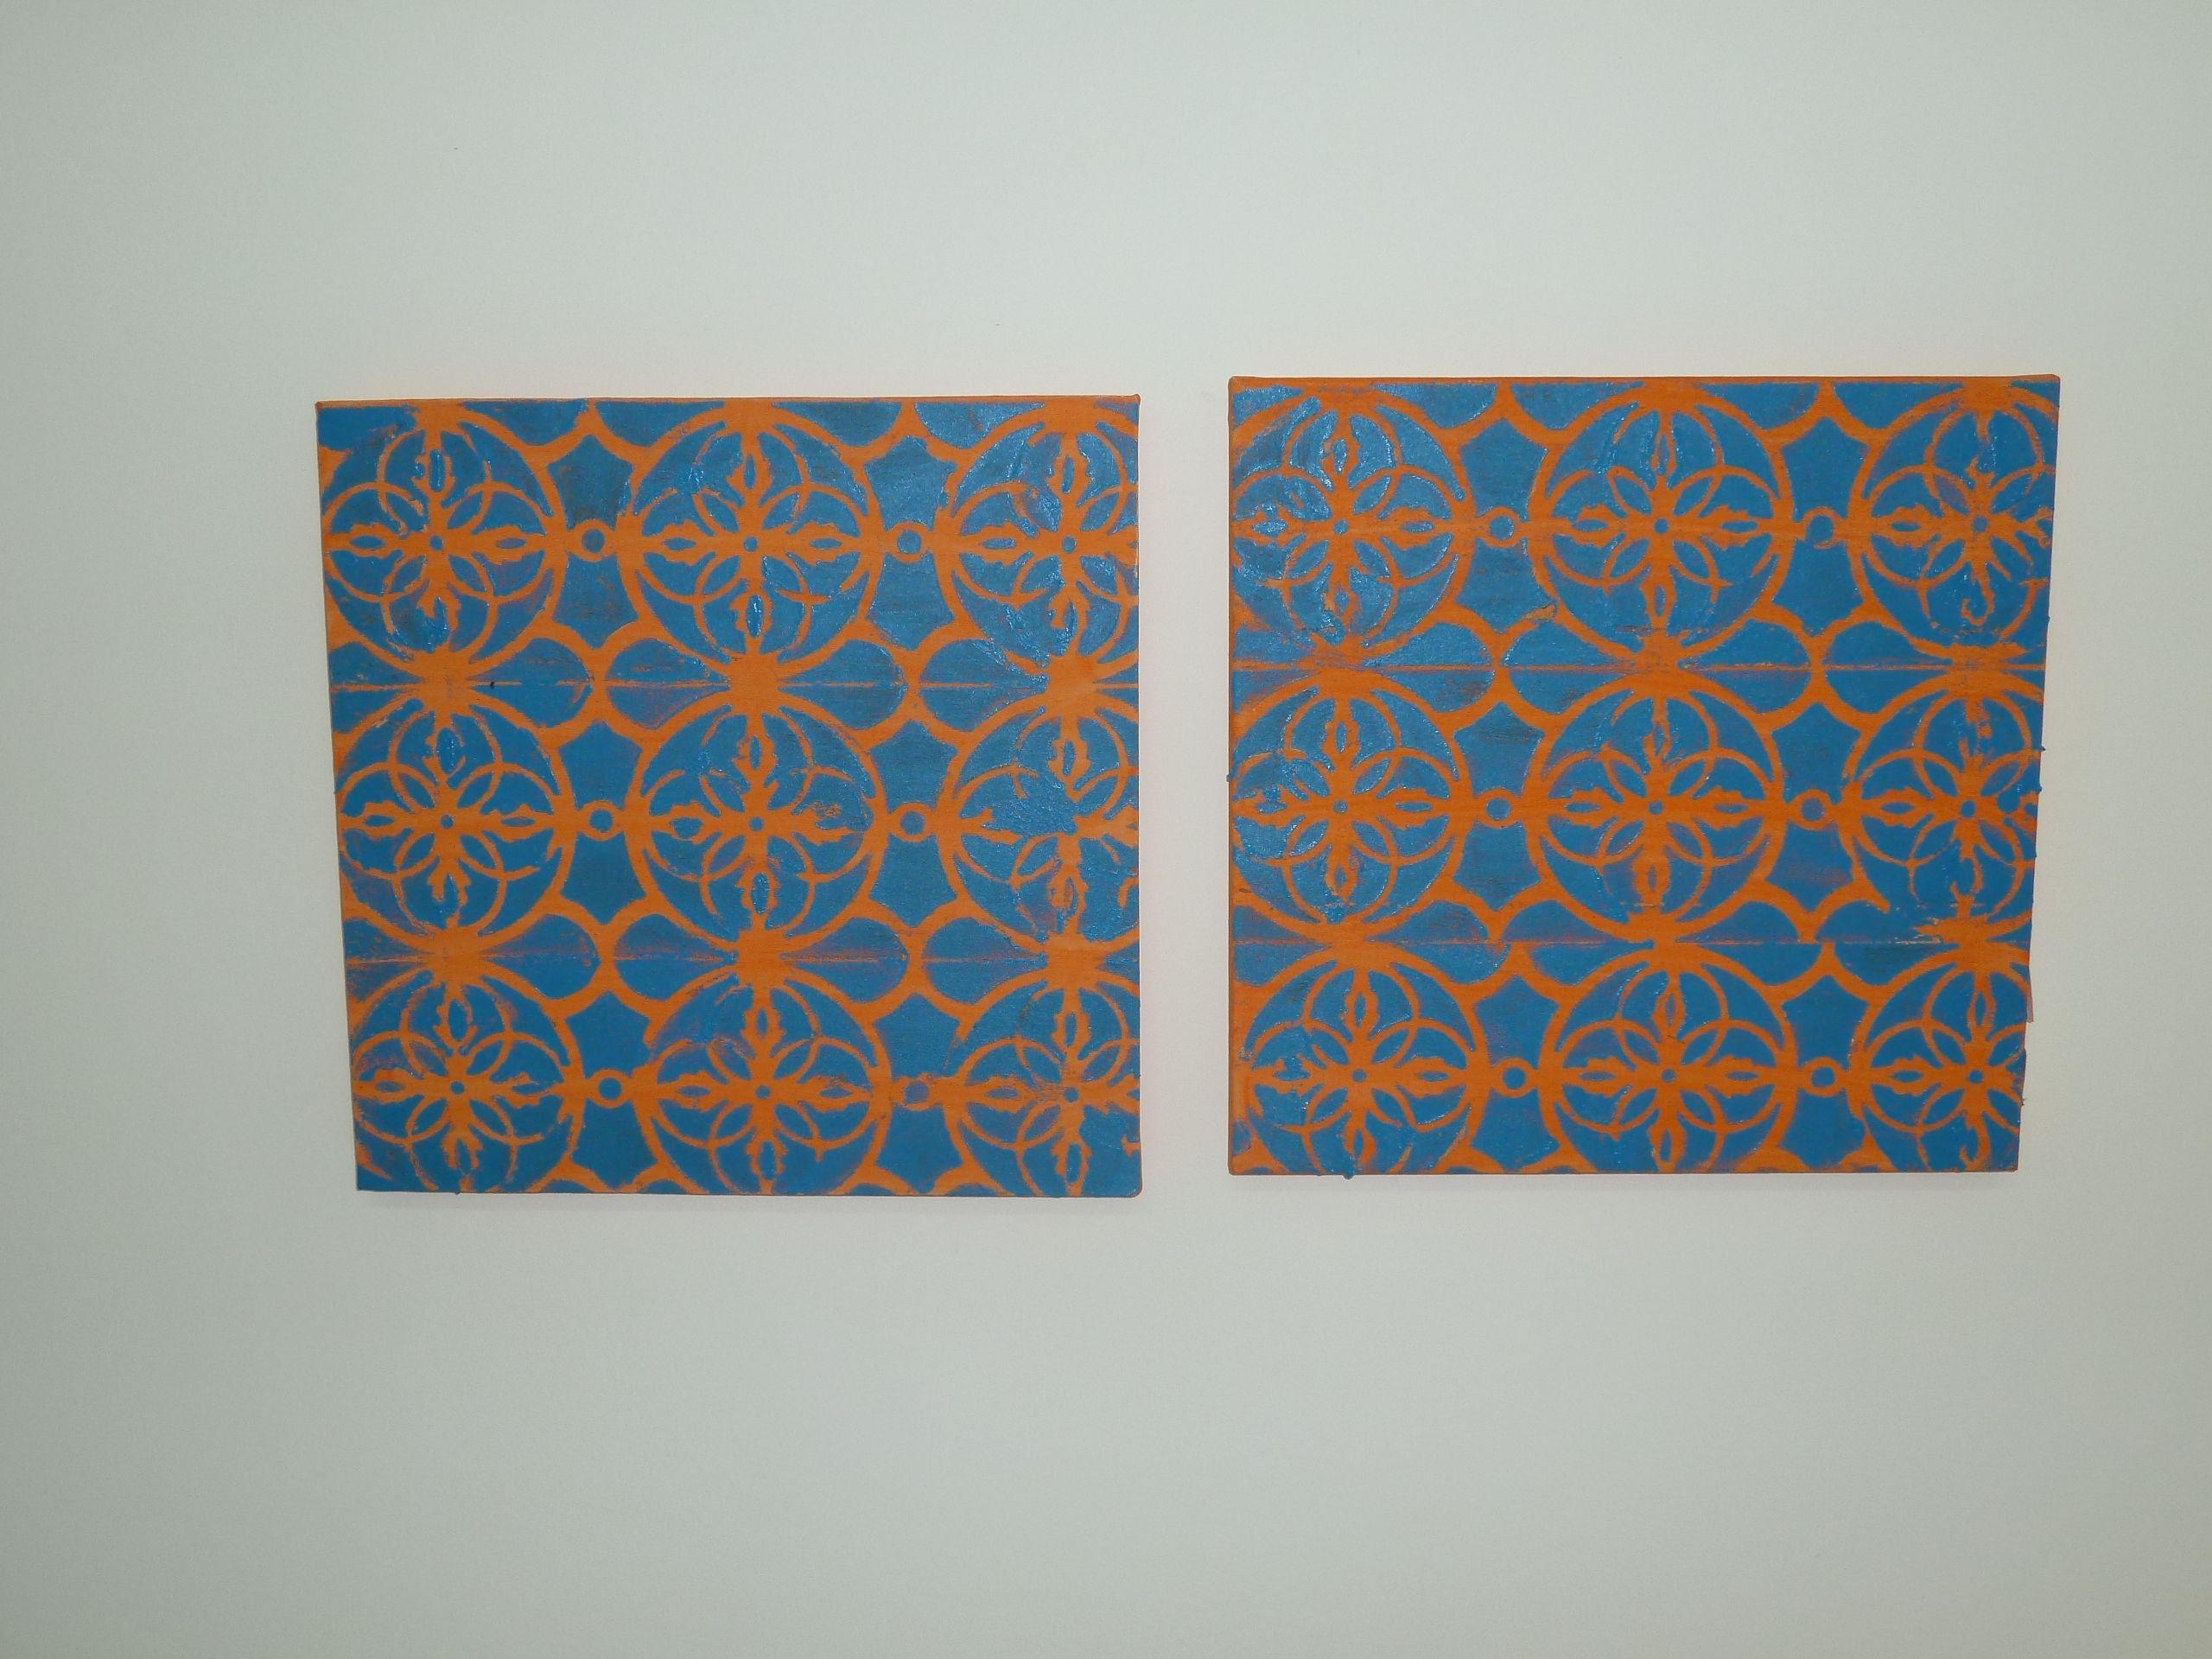 tela Laranja Blue em pintura acrilica 2011- 30x30 Diptico - acrylic on canvas -  Melina Ollandezos